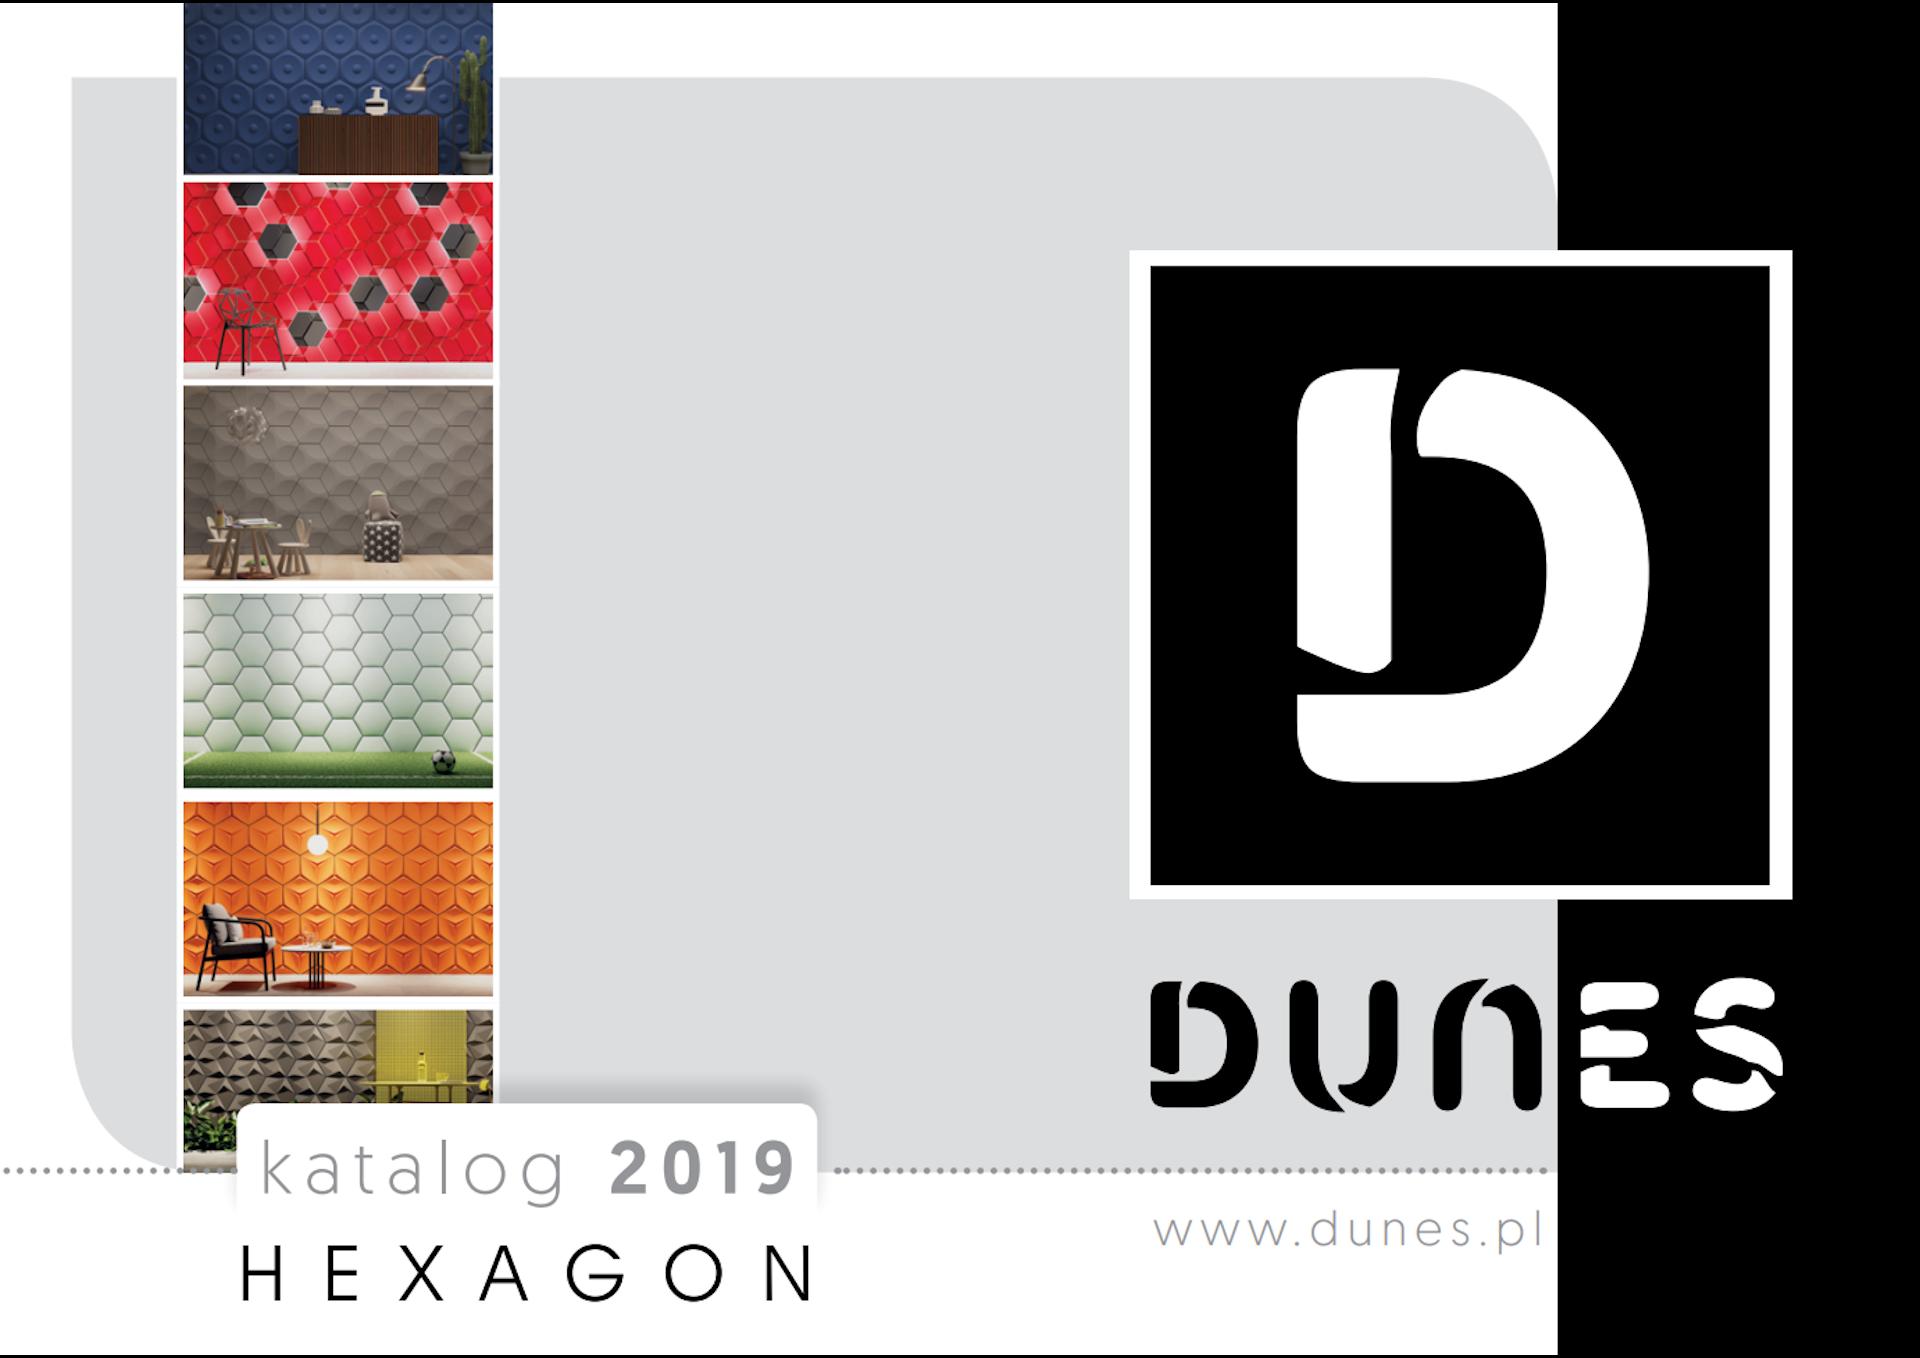 dunes-montaz-hexagon-katalog